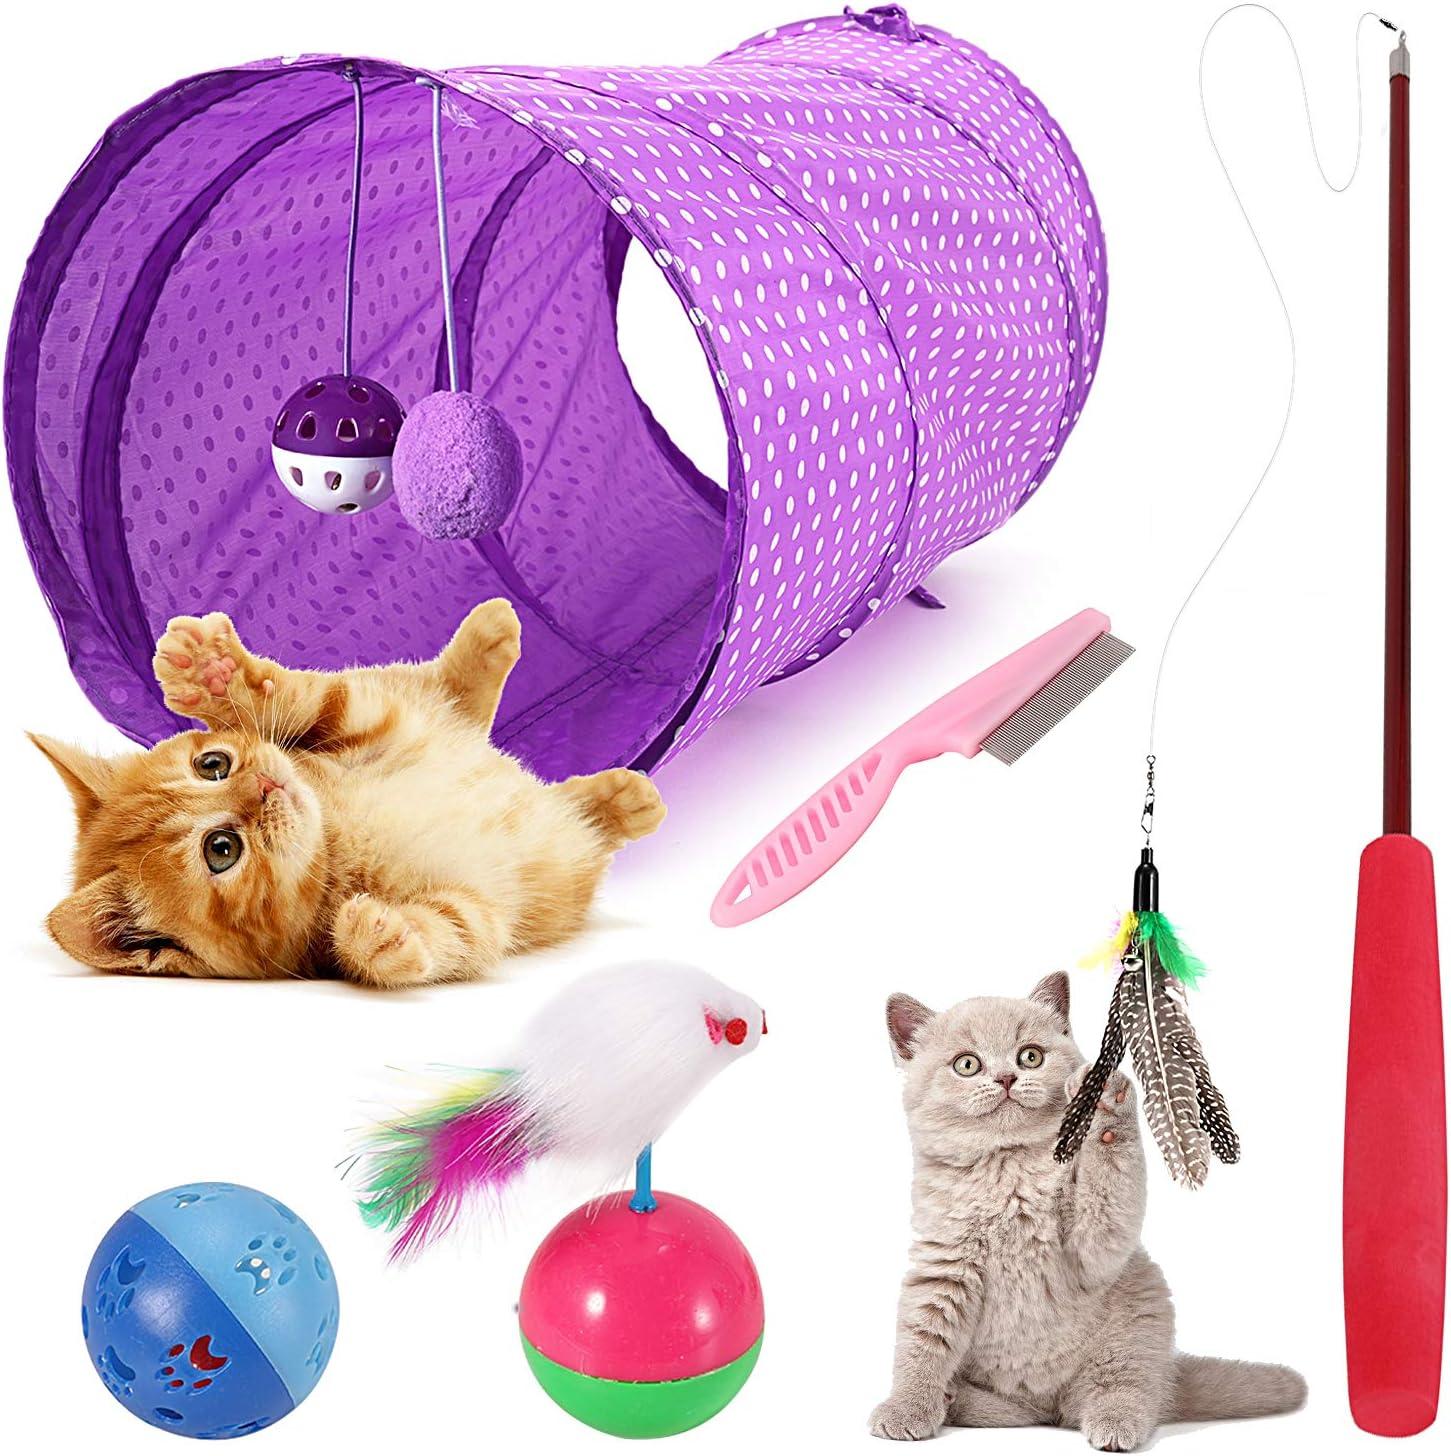 Juguete Gato, Emooqi Juguete Gato, Varita De Juguete Para Gatos, Juguete De Plumas De Gato Interactivo Juguete Varita De Con 6 Piezas Diferentes De Juguete Divertido Juguetes Para Mascotas Gatos